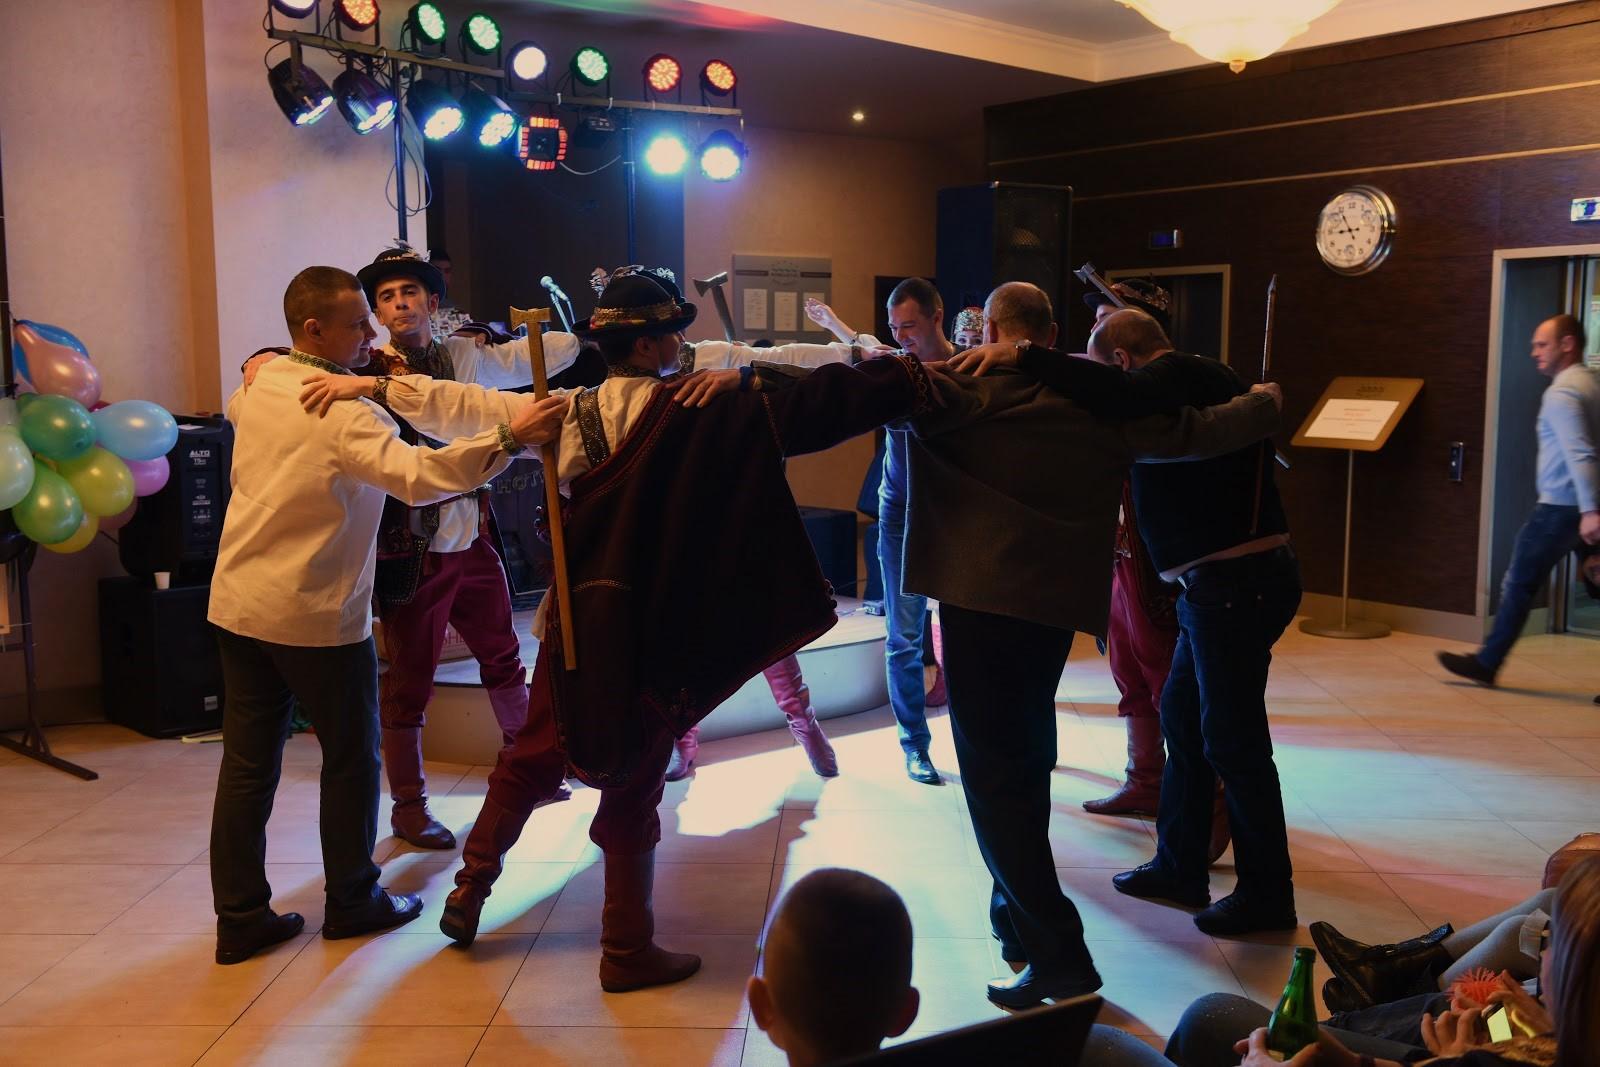 танец аркан в Романтик Спа Отель картинка